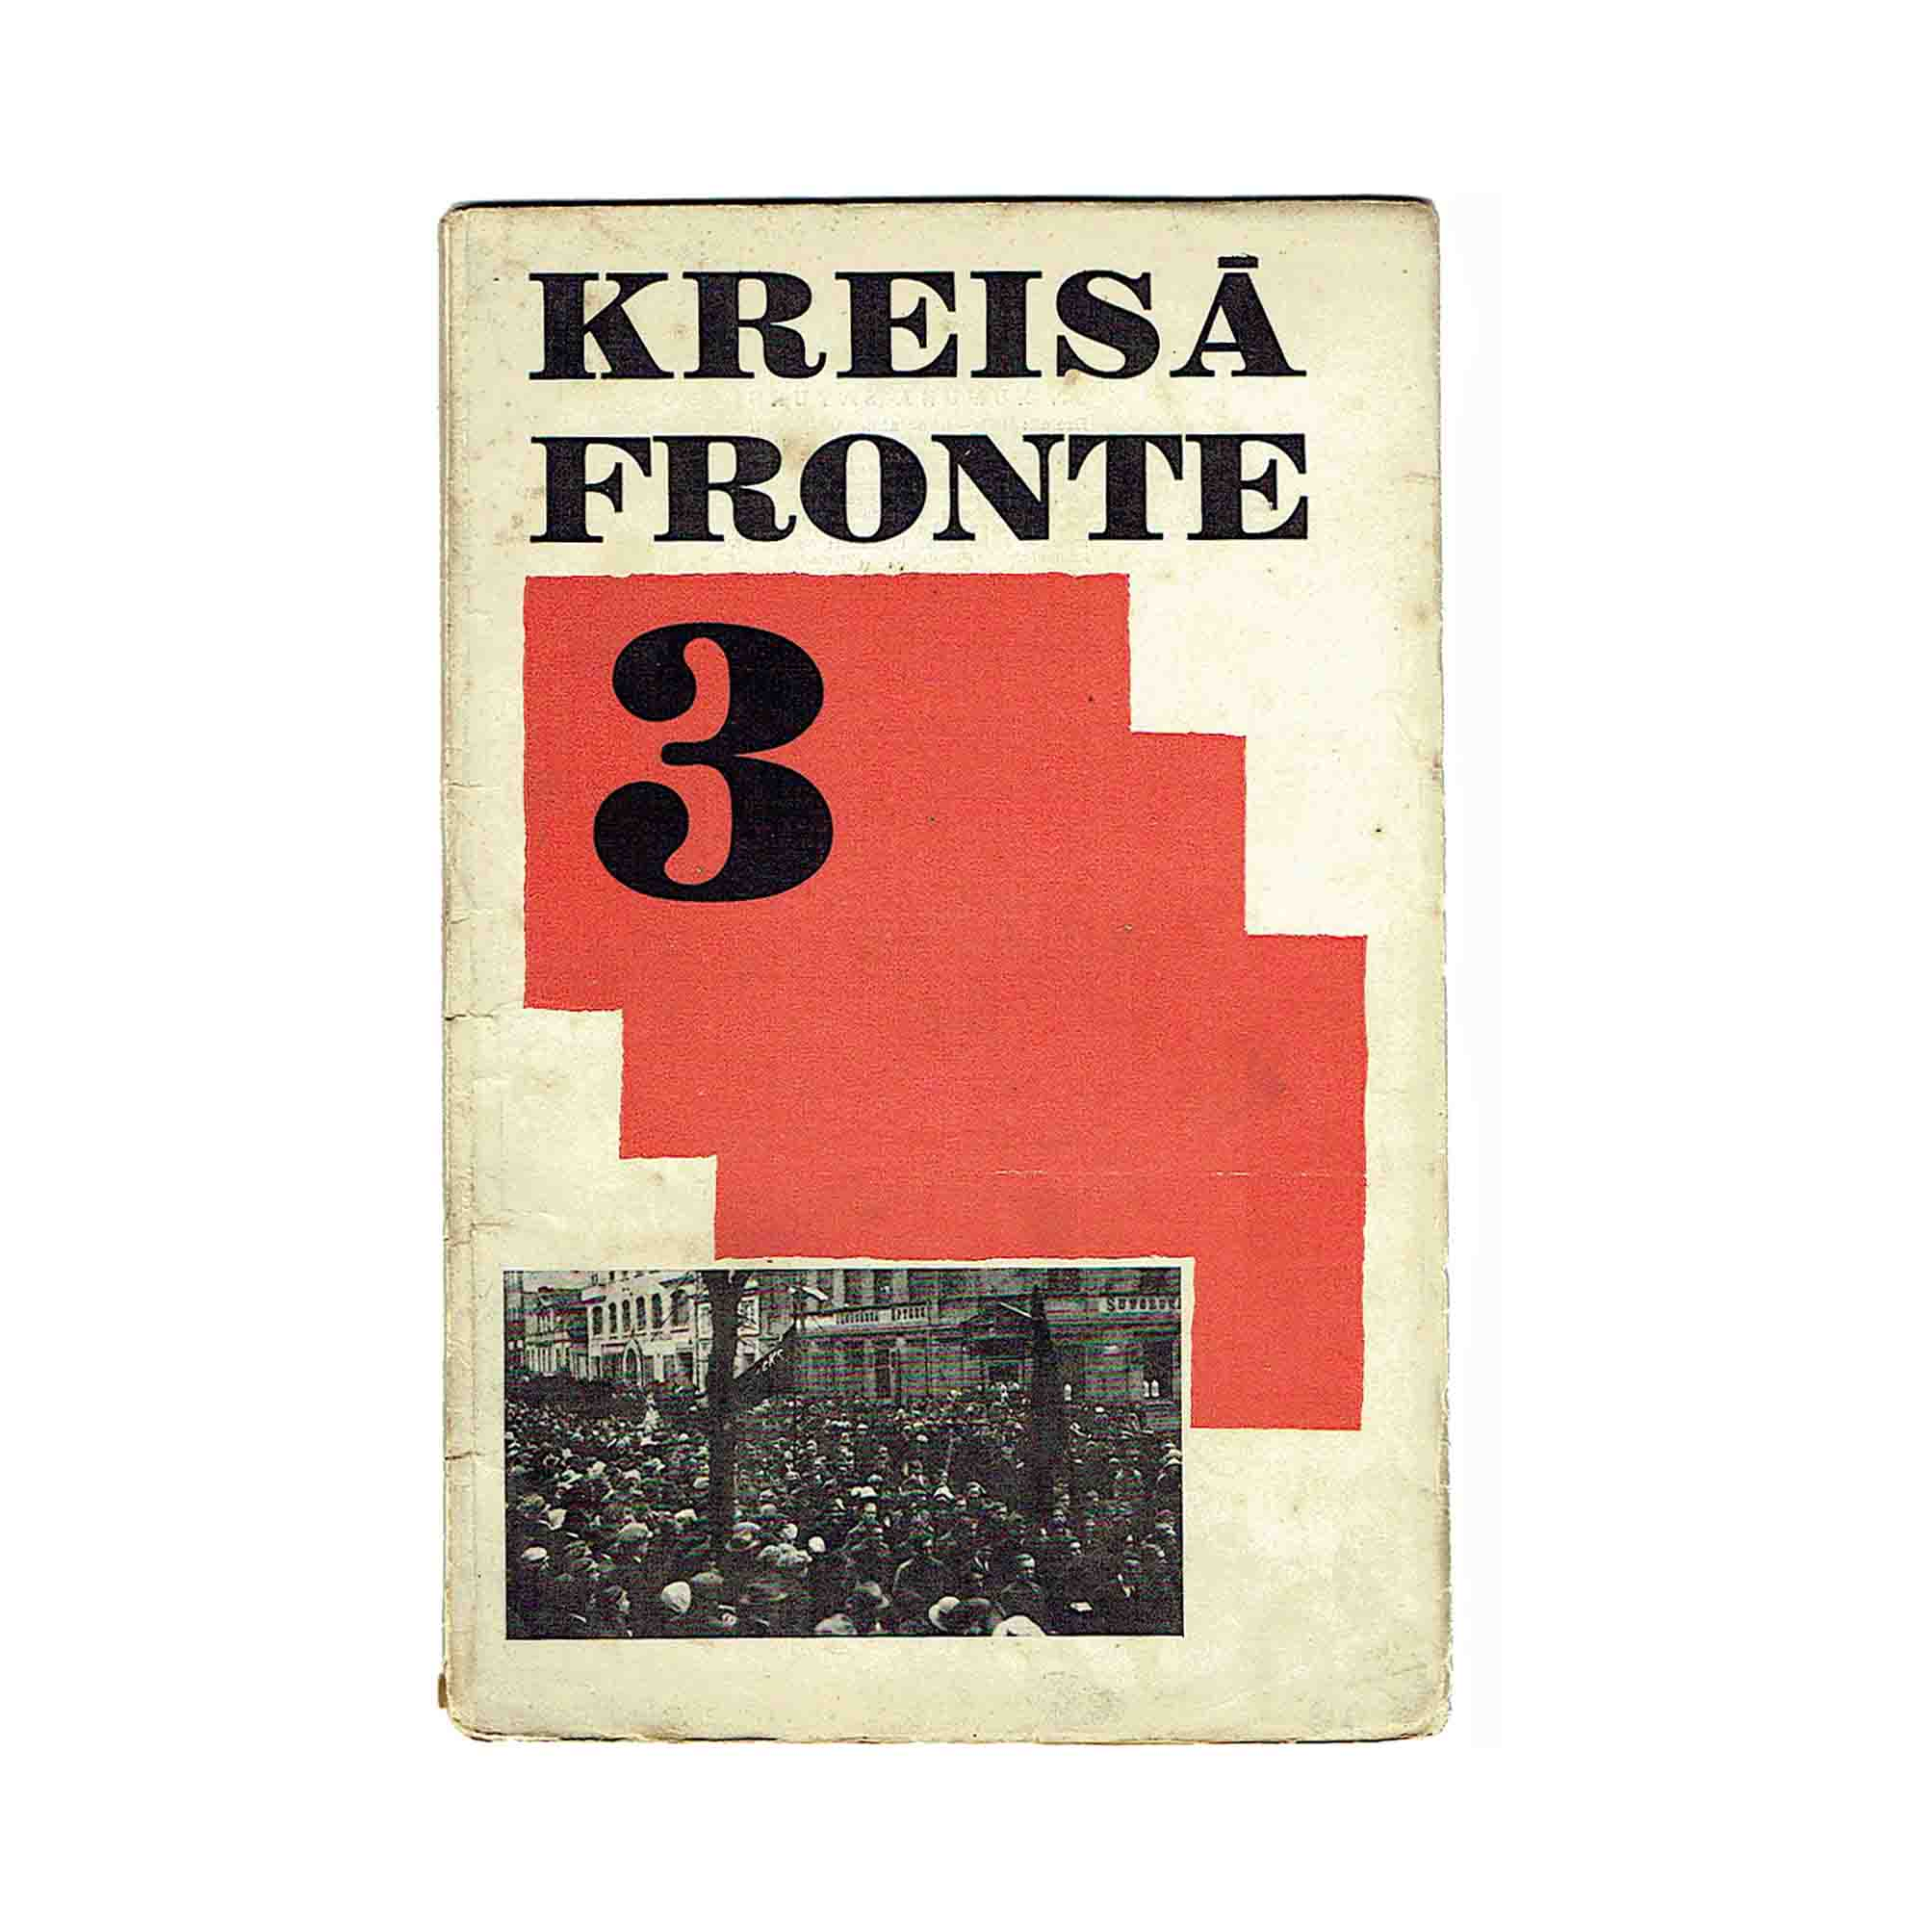 5832K-Kreisa-Front-3-1928-Umschlag-recto-frei-N.jpeg